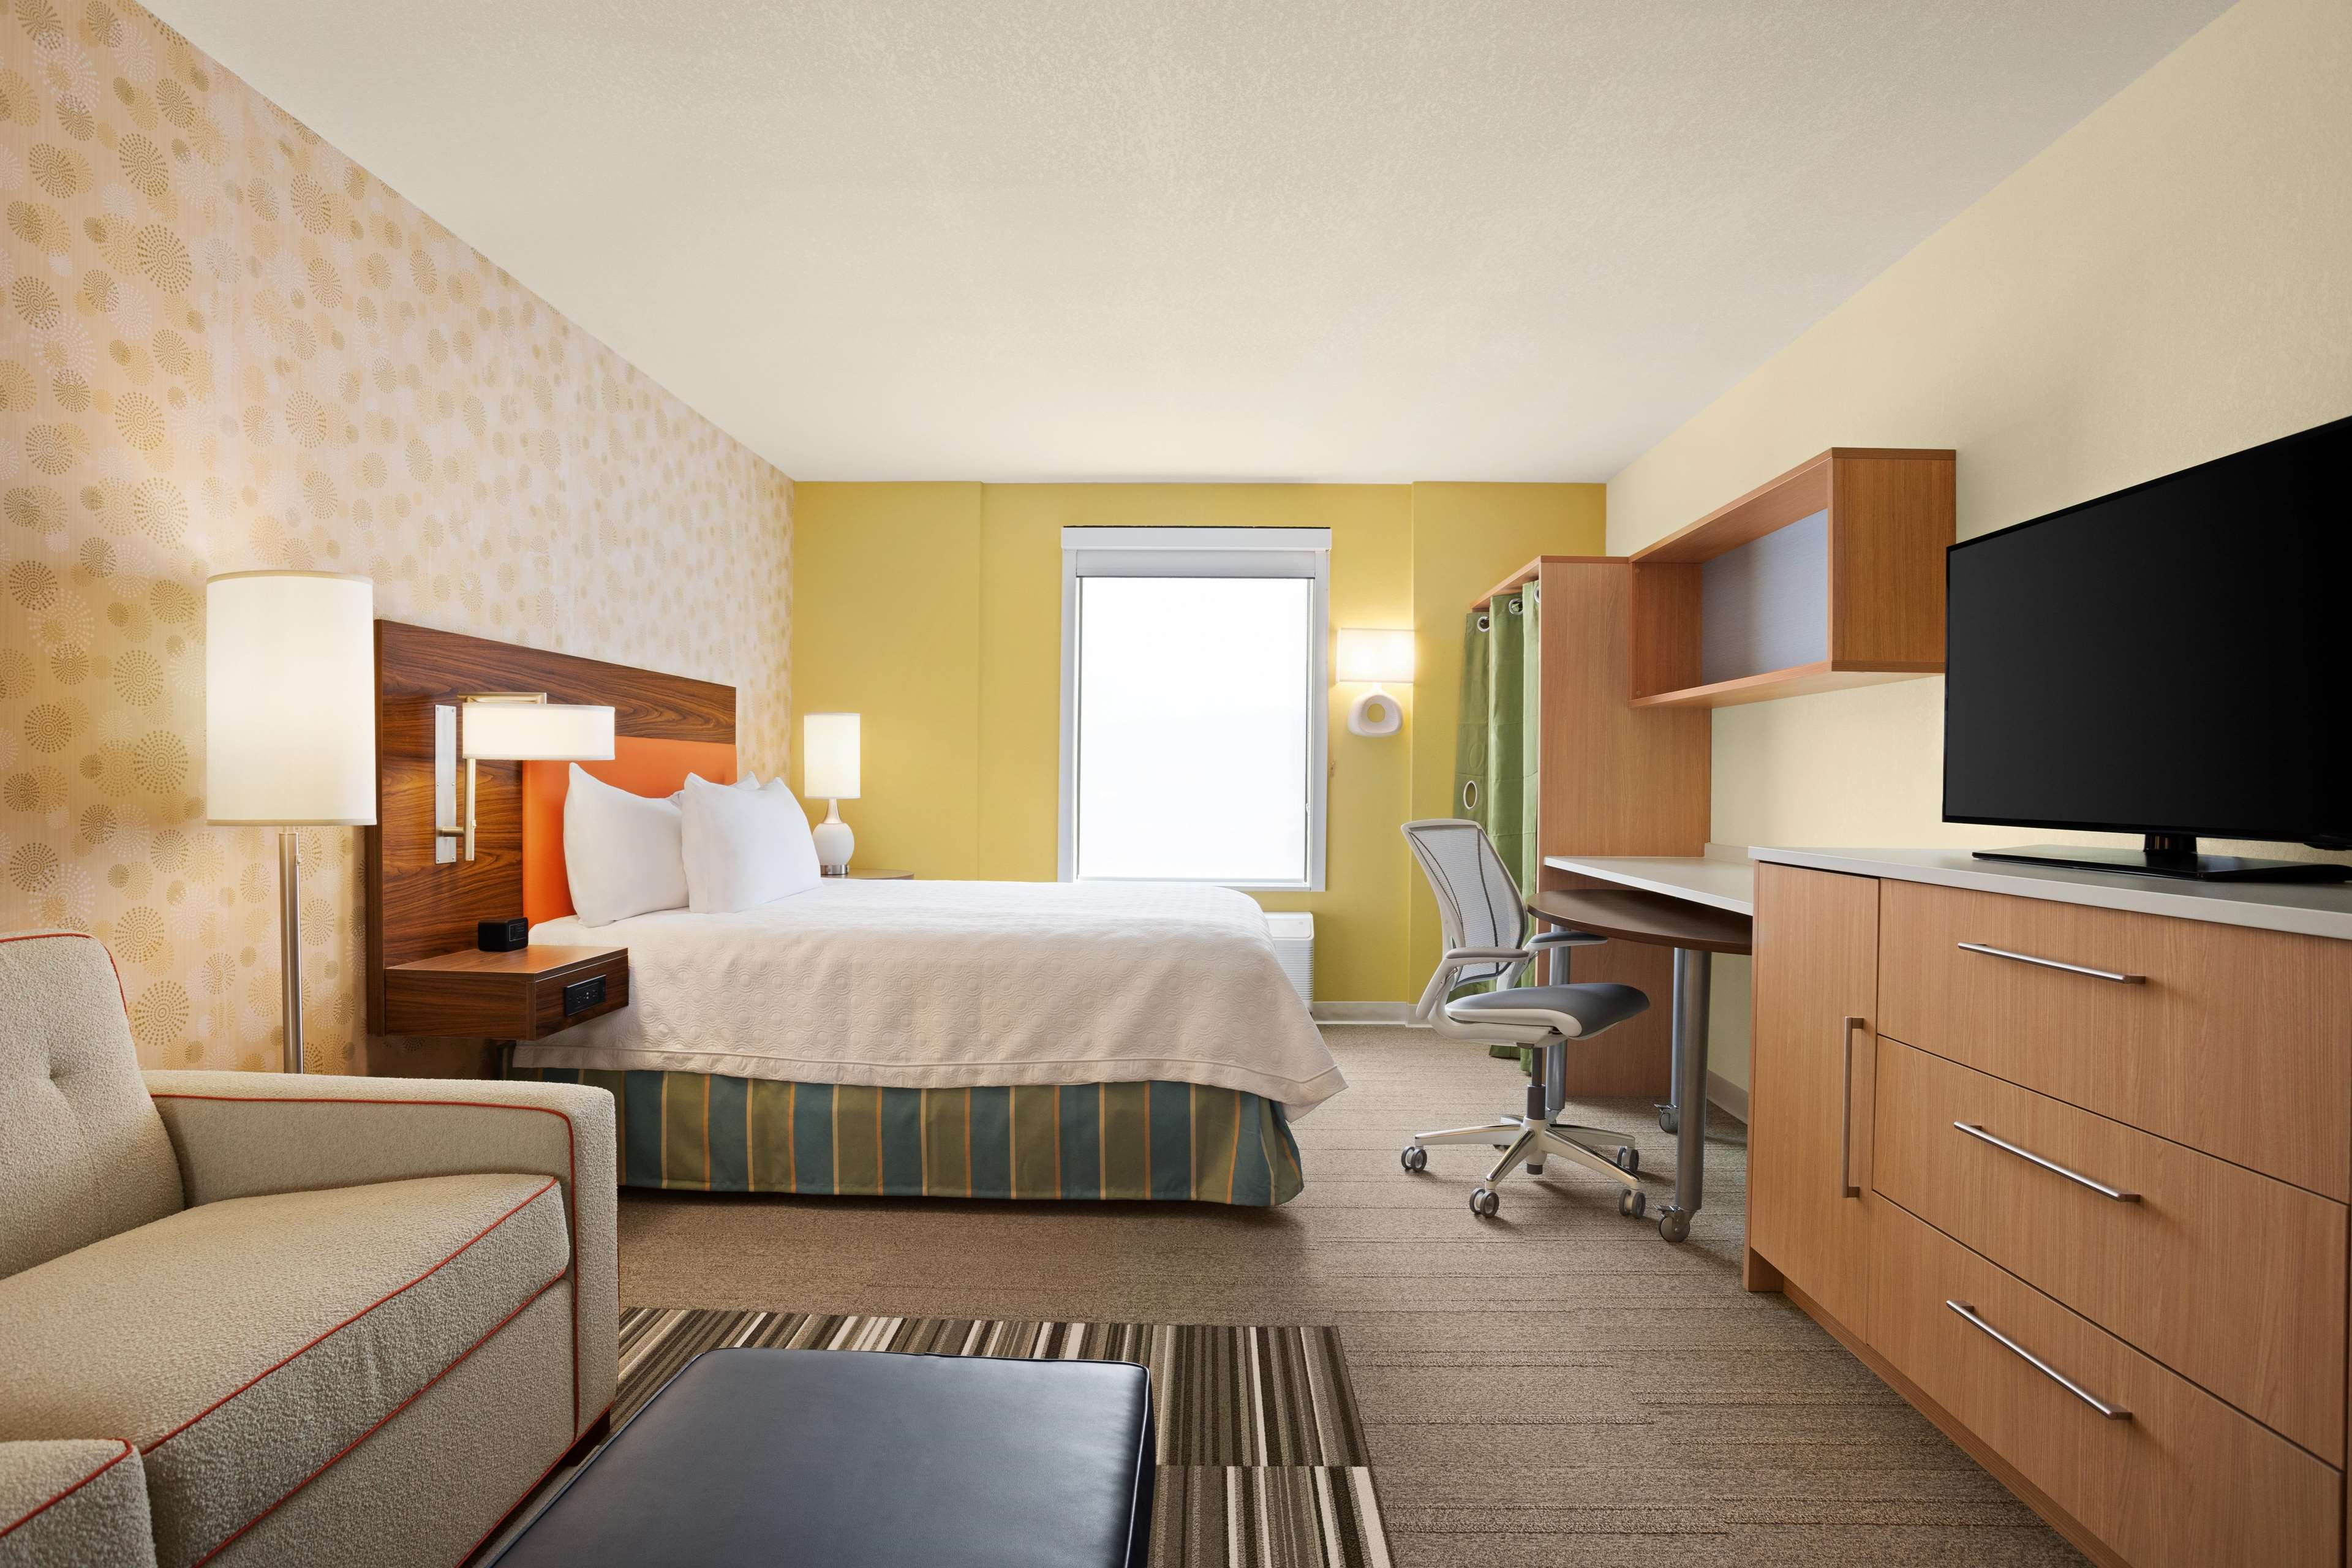 Home2 Suites by Hilton Elko image 17